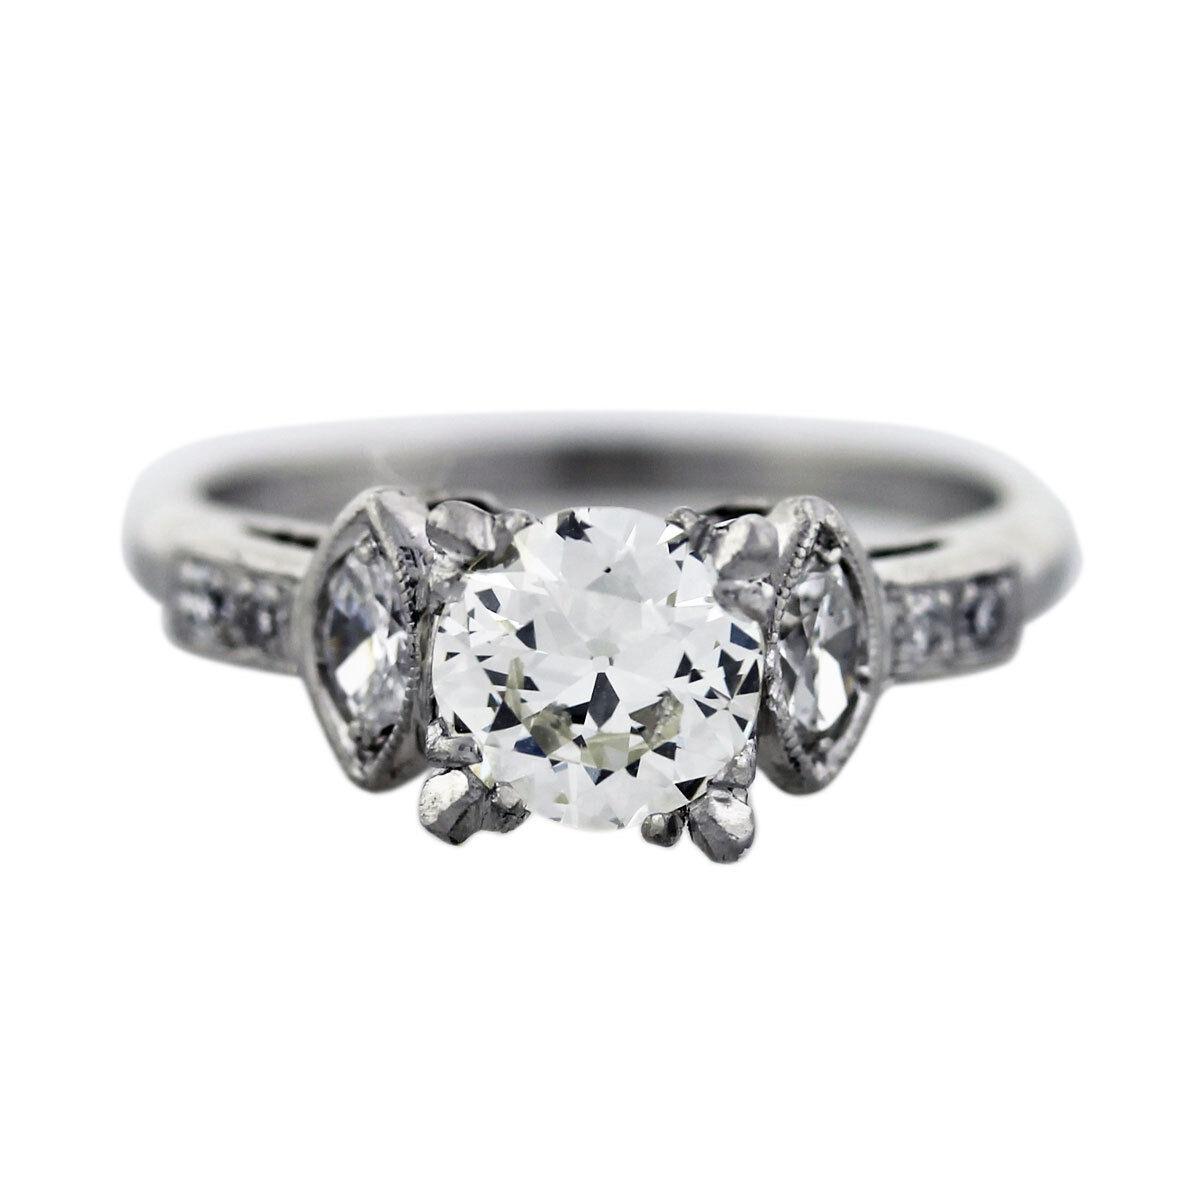 antique engagement ring, vintage engagement ring ebay, antique engagement ring boca